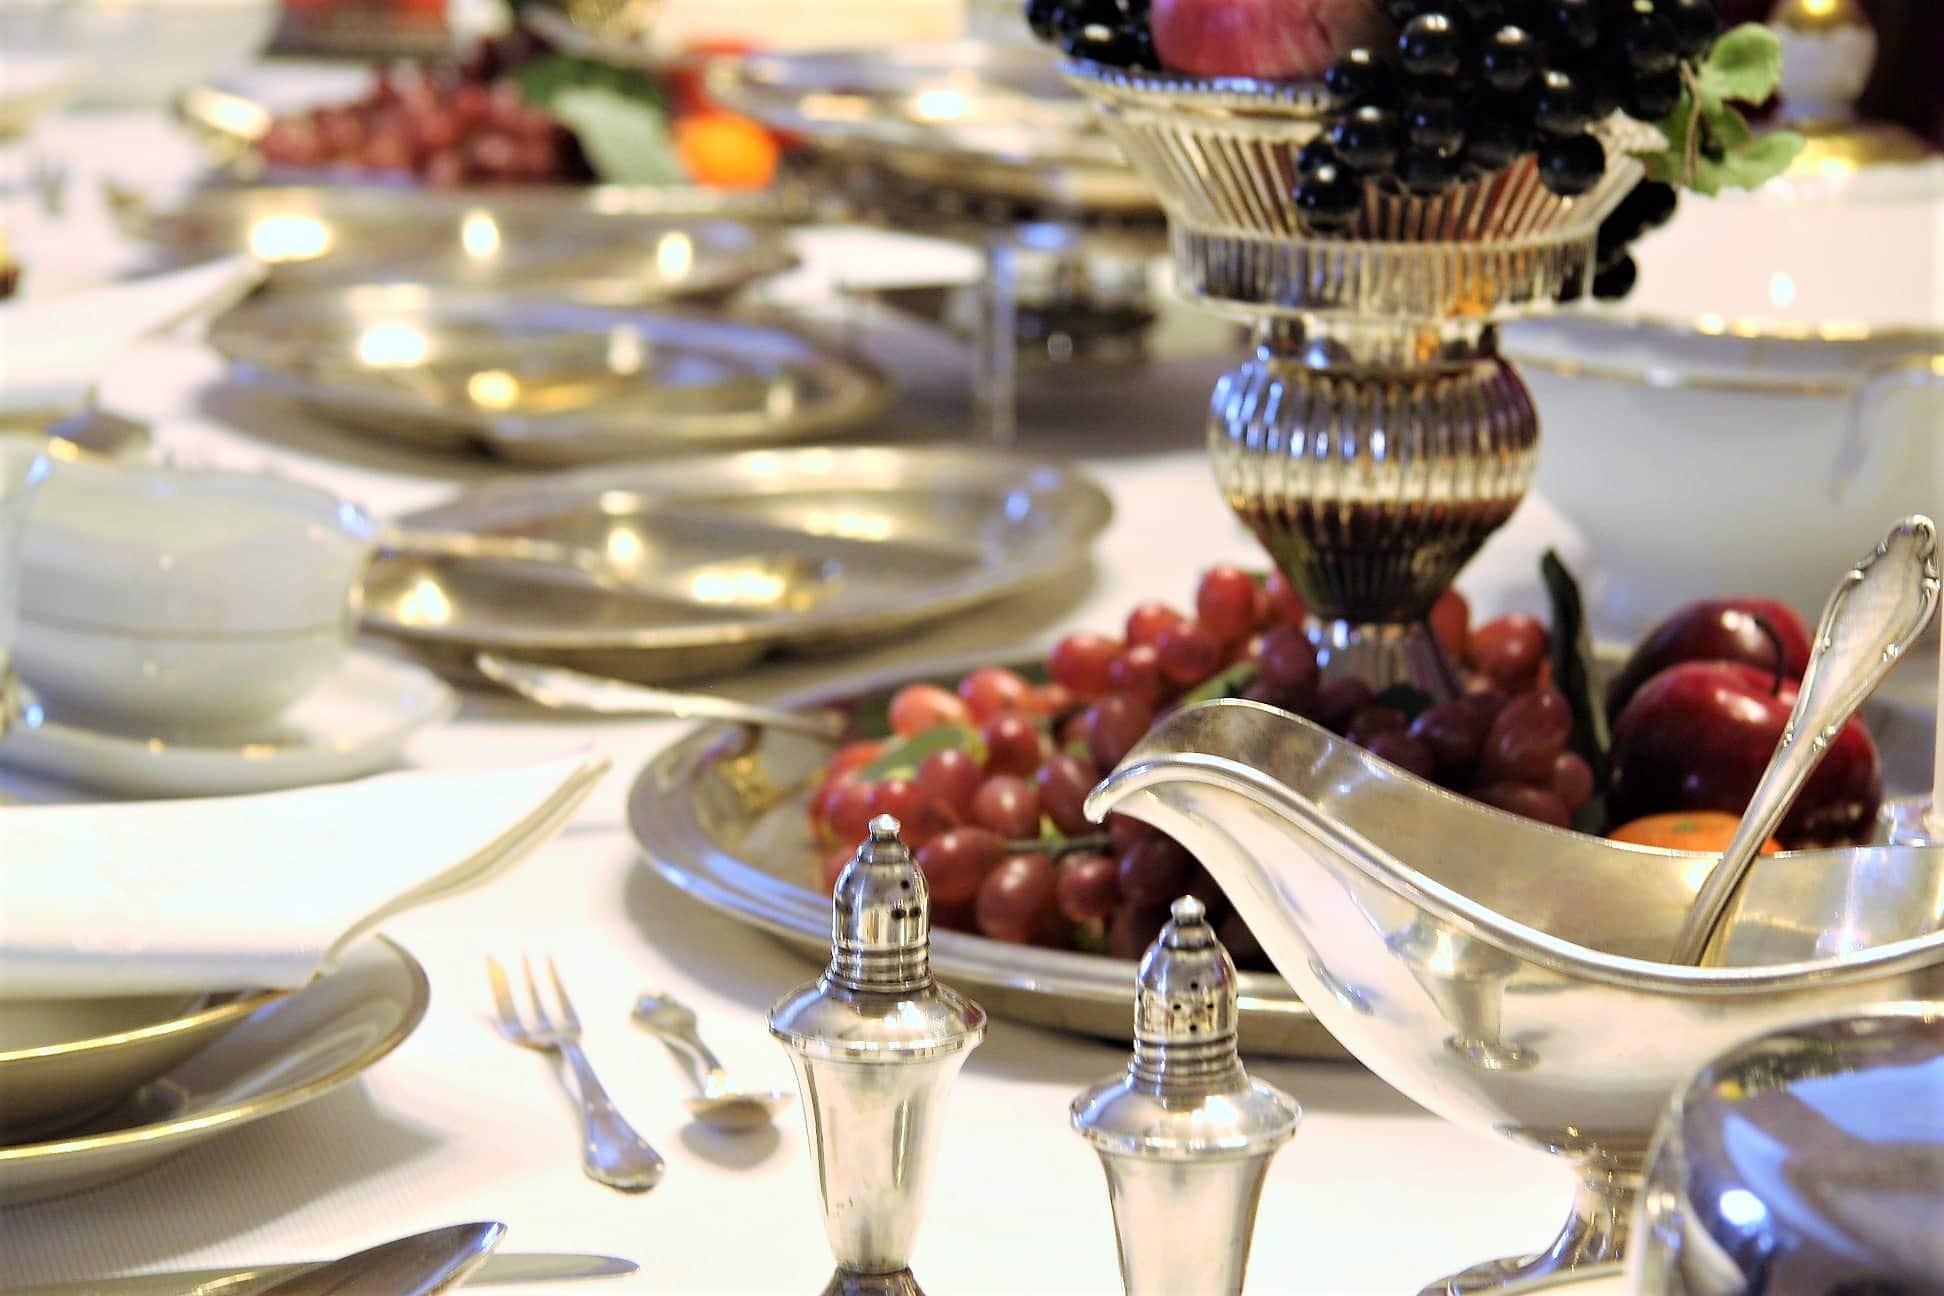 style hannover Tafelsilber im WOK Museum - Europas größtes Küchenmuseum